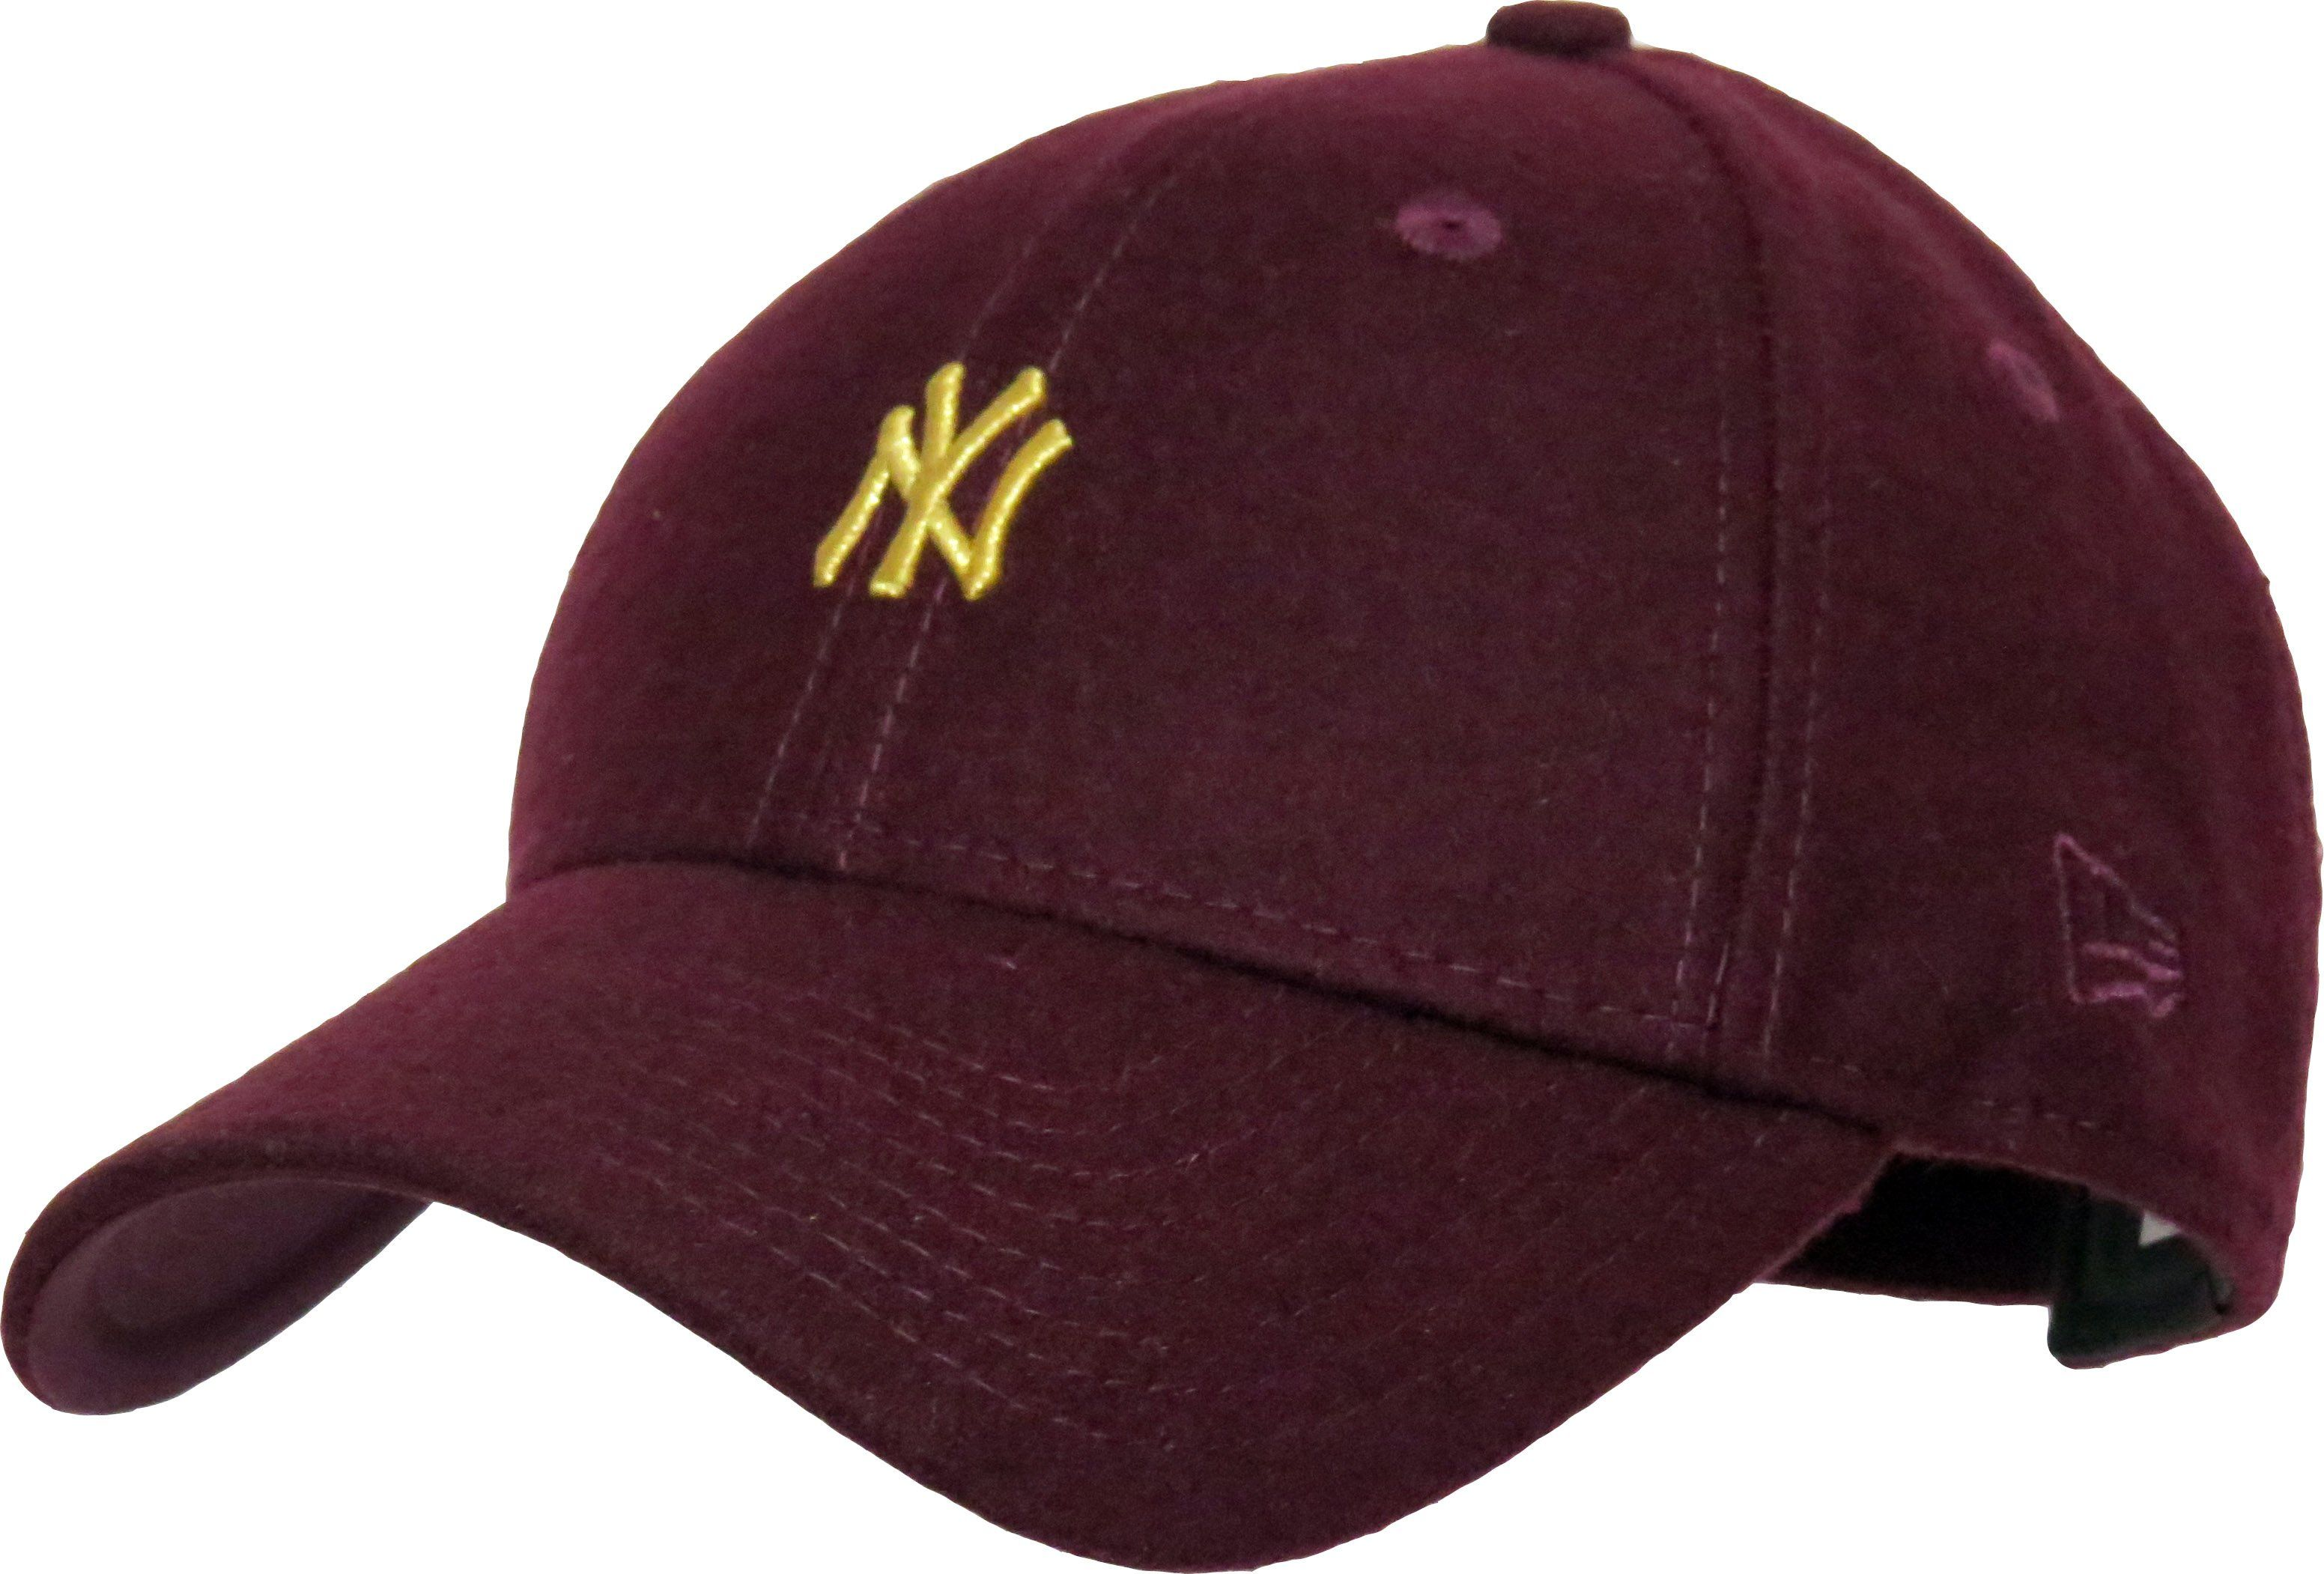 cf3efb4fa4c New Era 9Forty Womens Melton Wool Baseball Cap. Maroon coloured ...